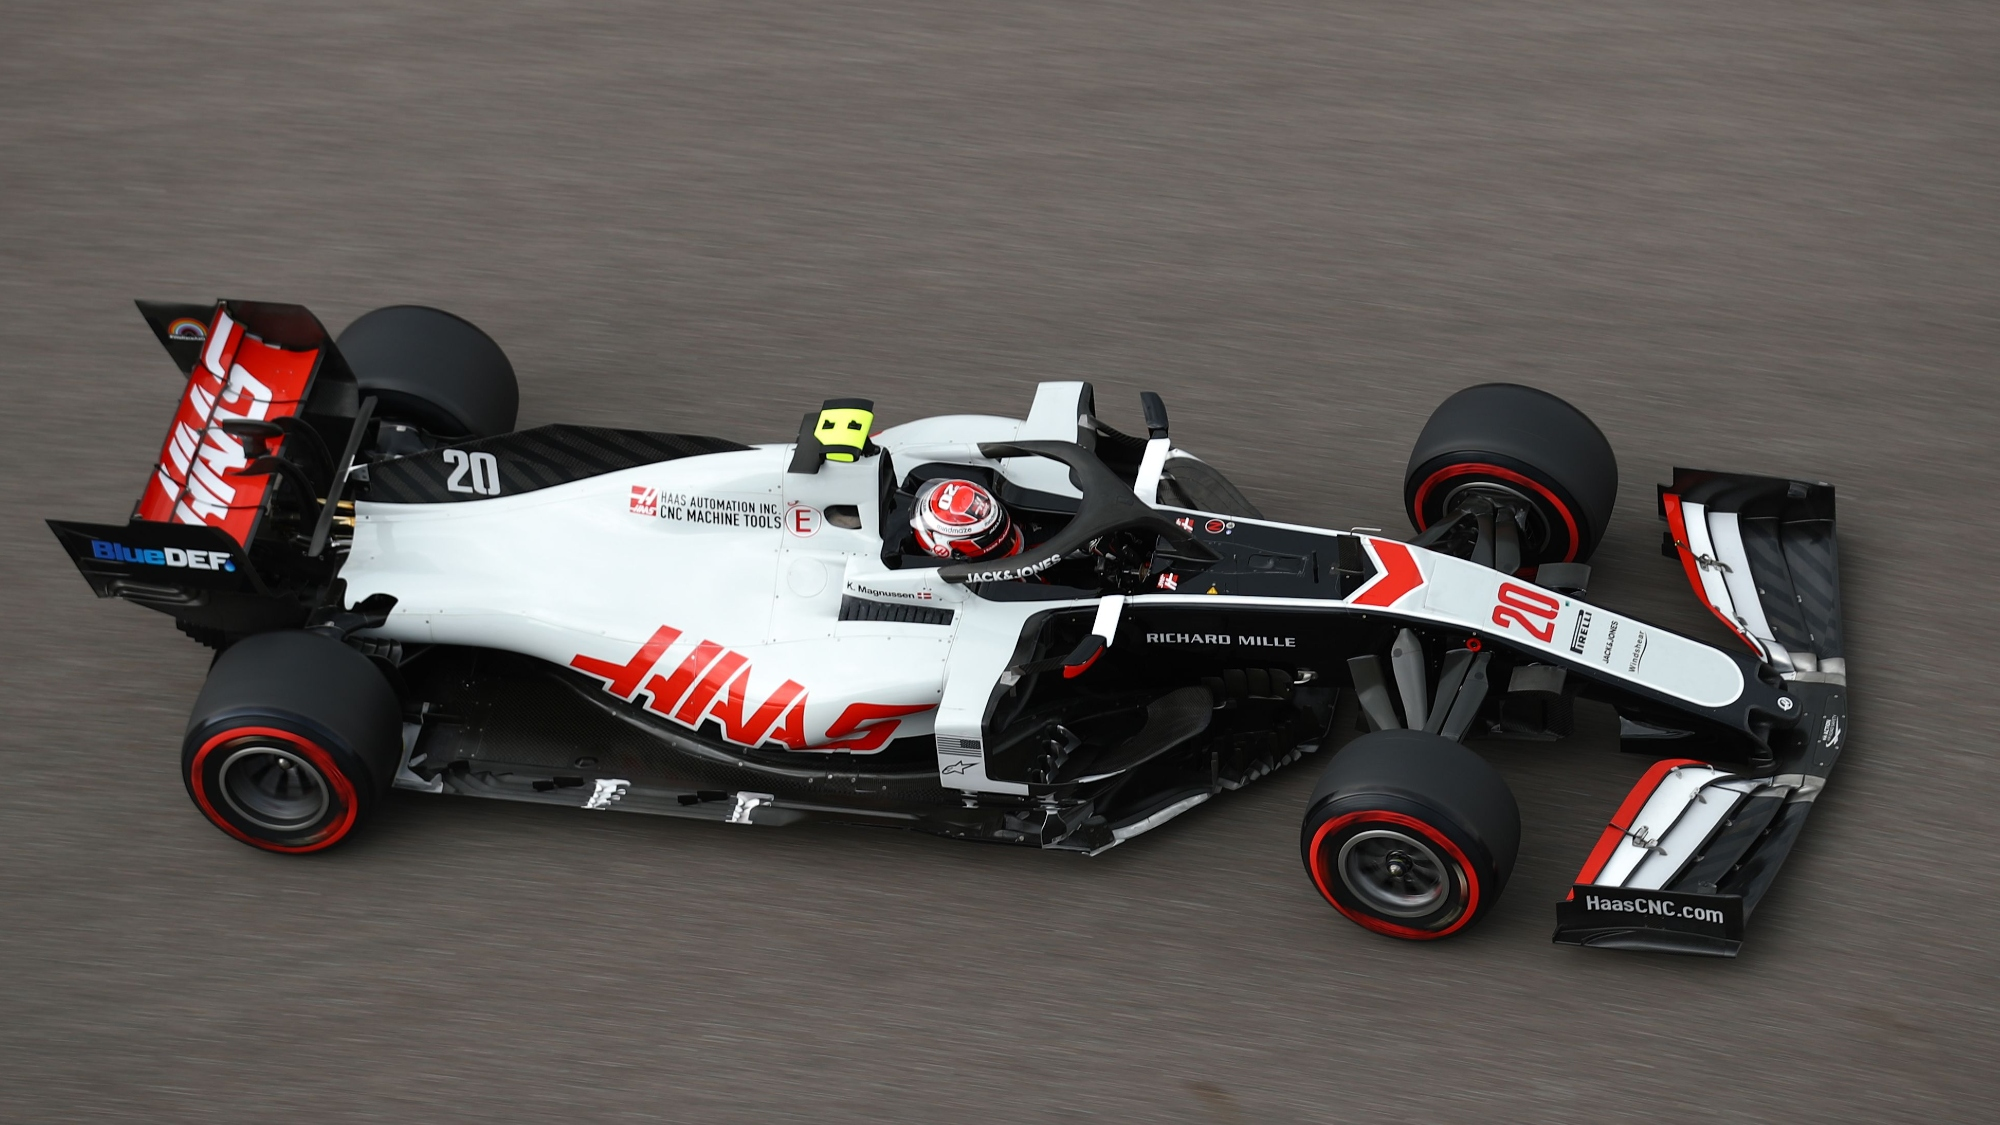 Kevin Magnussen, 2020 Russian GP